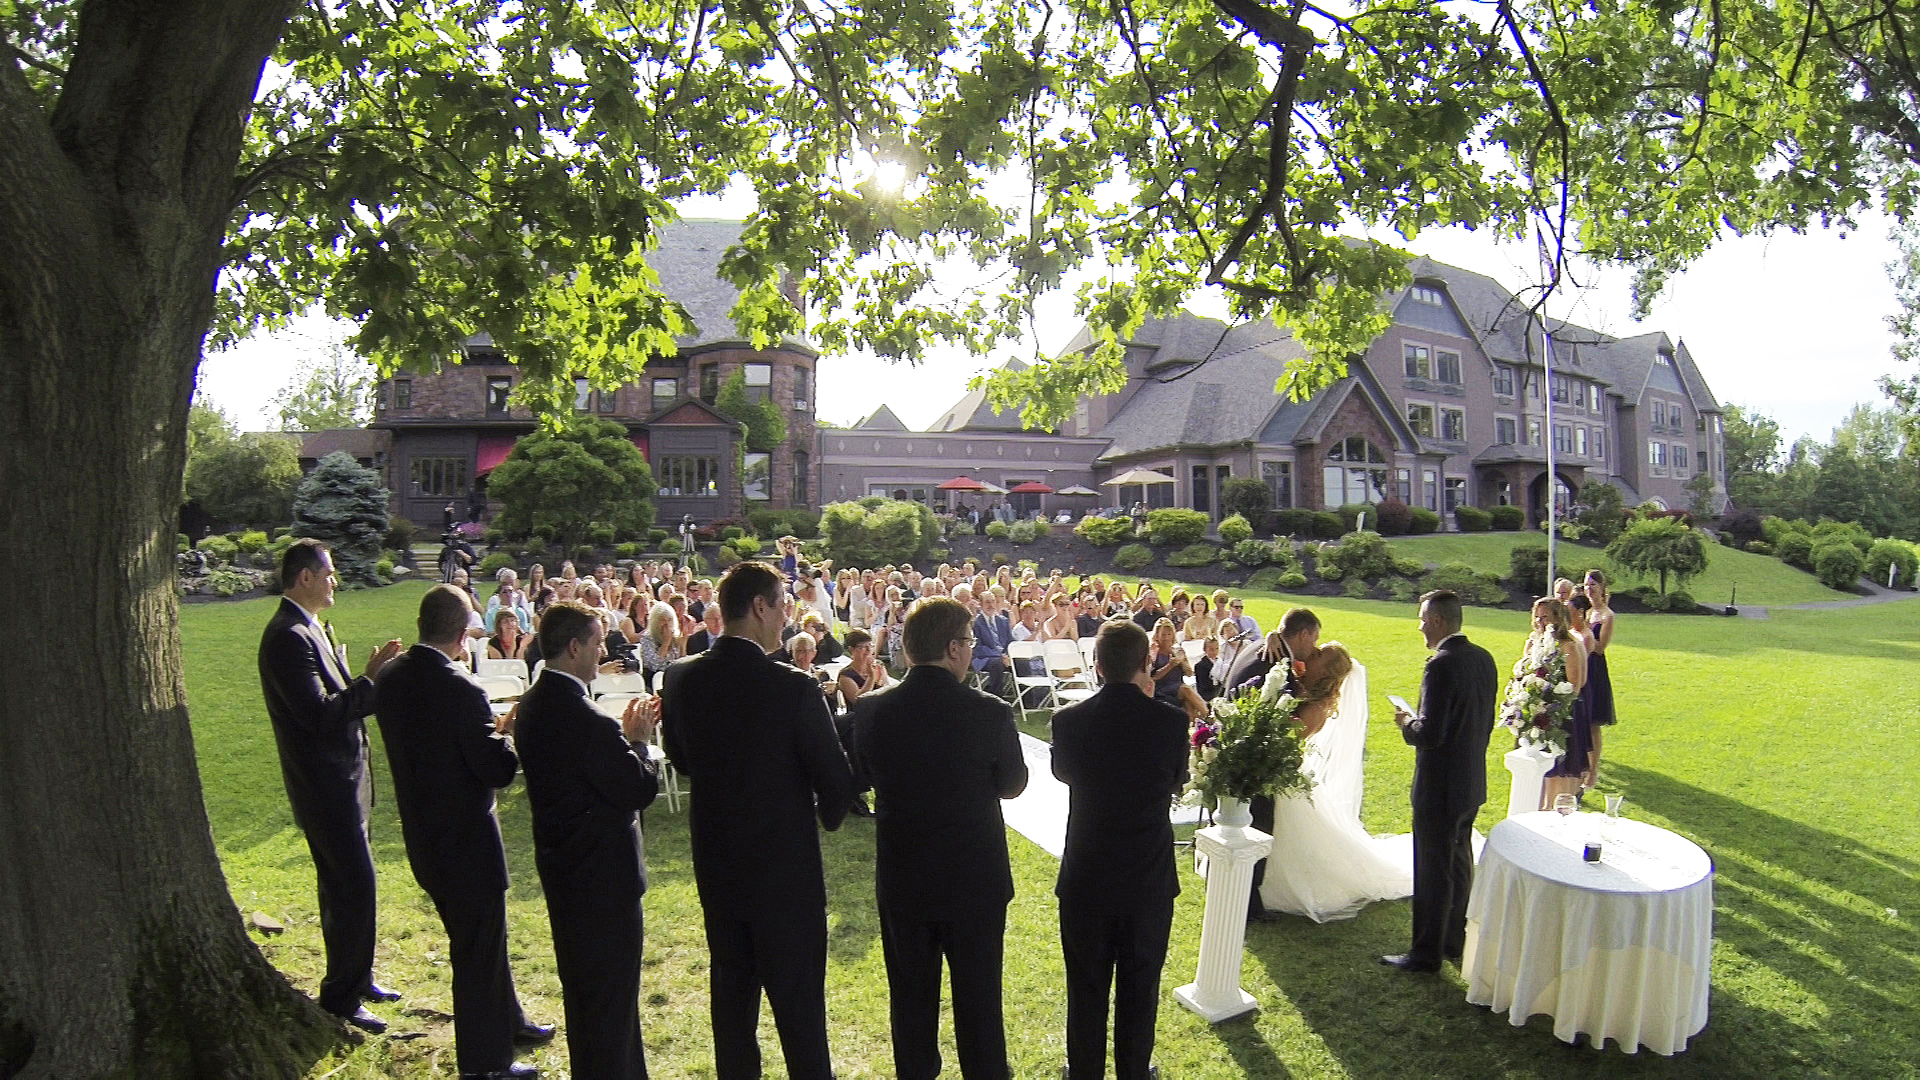 Geoff & Danielle – Belhurst Castle Wedding, Geneva, NY